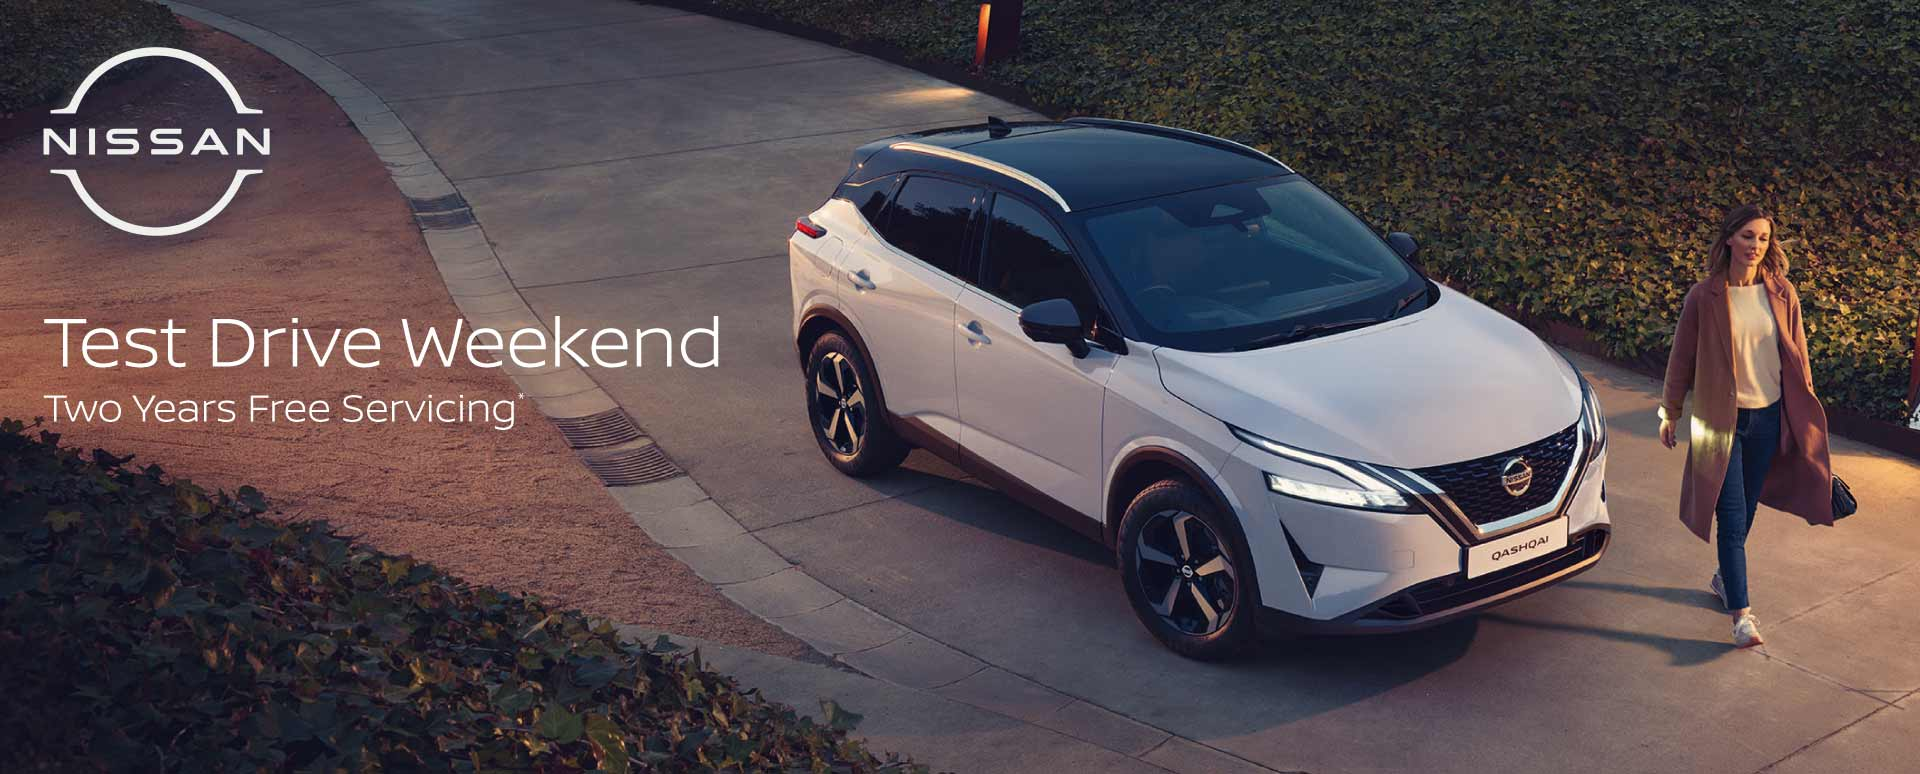 All-New Nissan Qashqai Test Drive Event